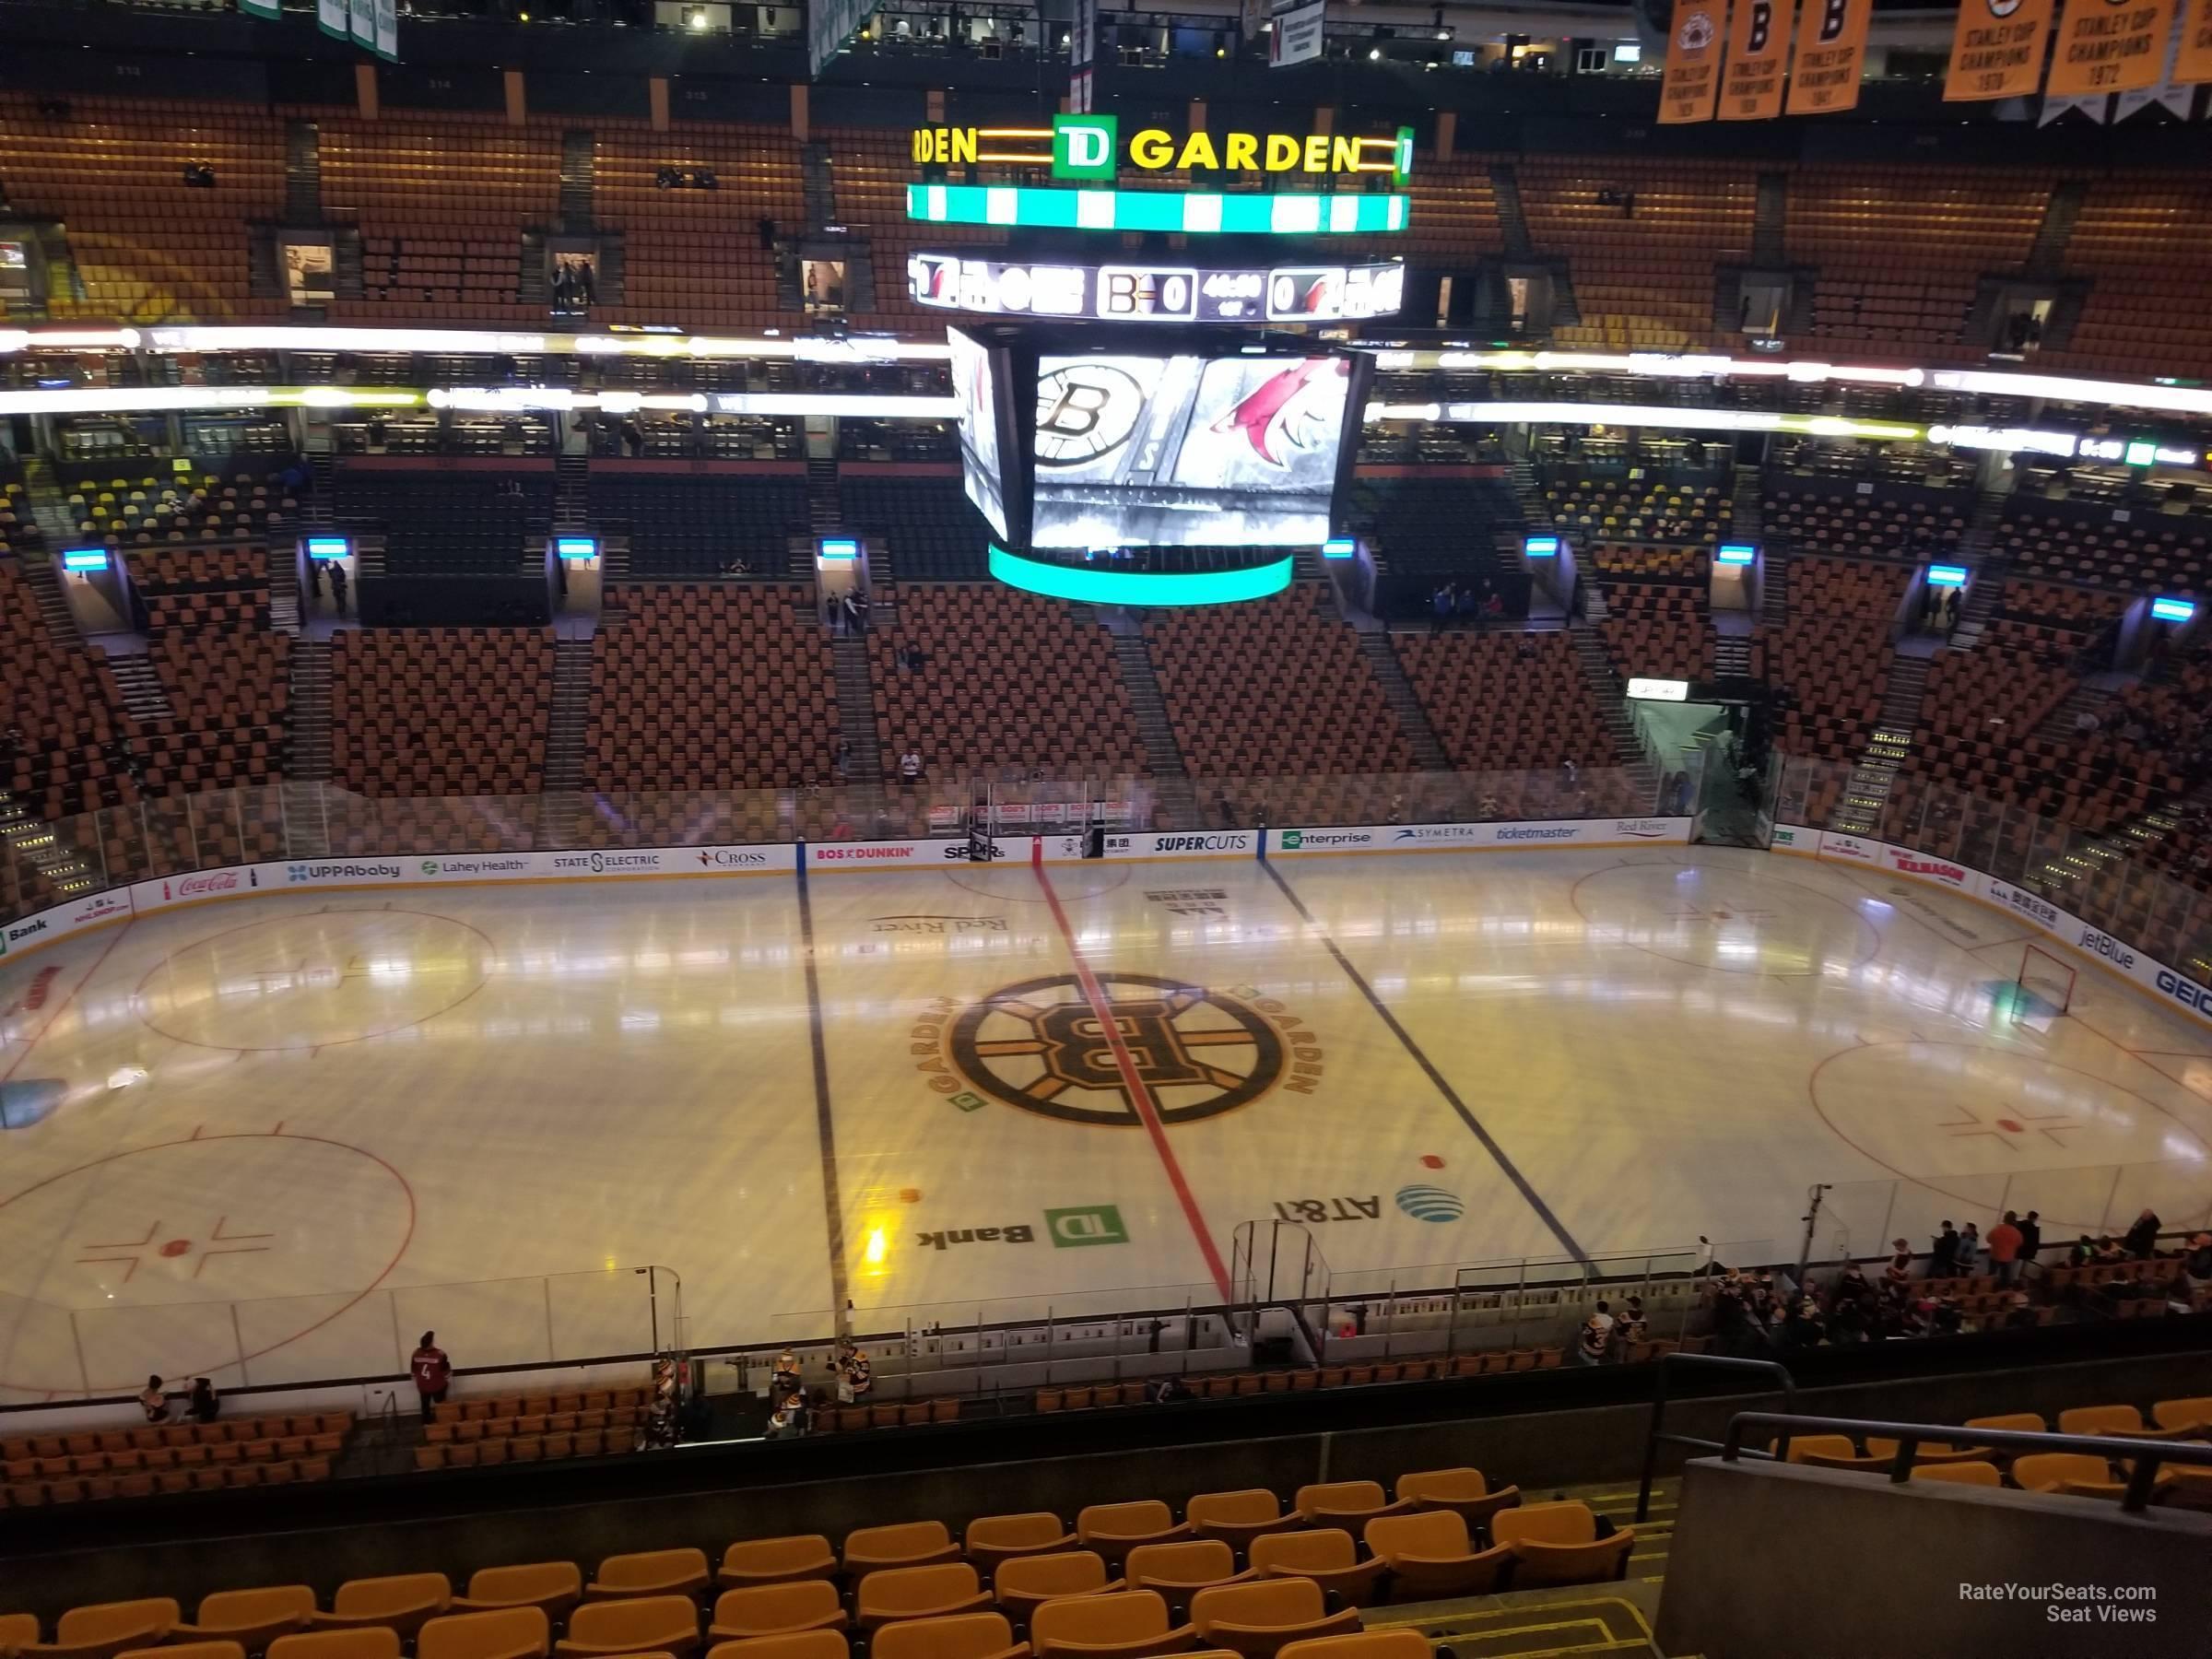 Td Garden Section 302 Boston Bruins Rateyourseats Com